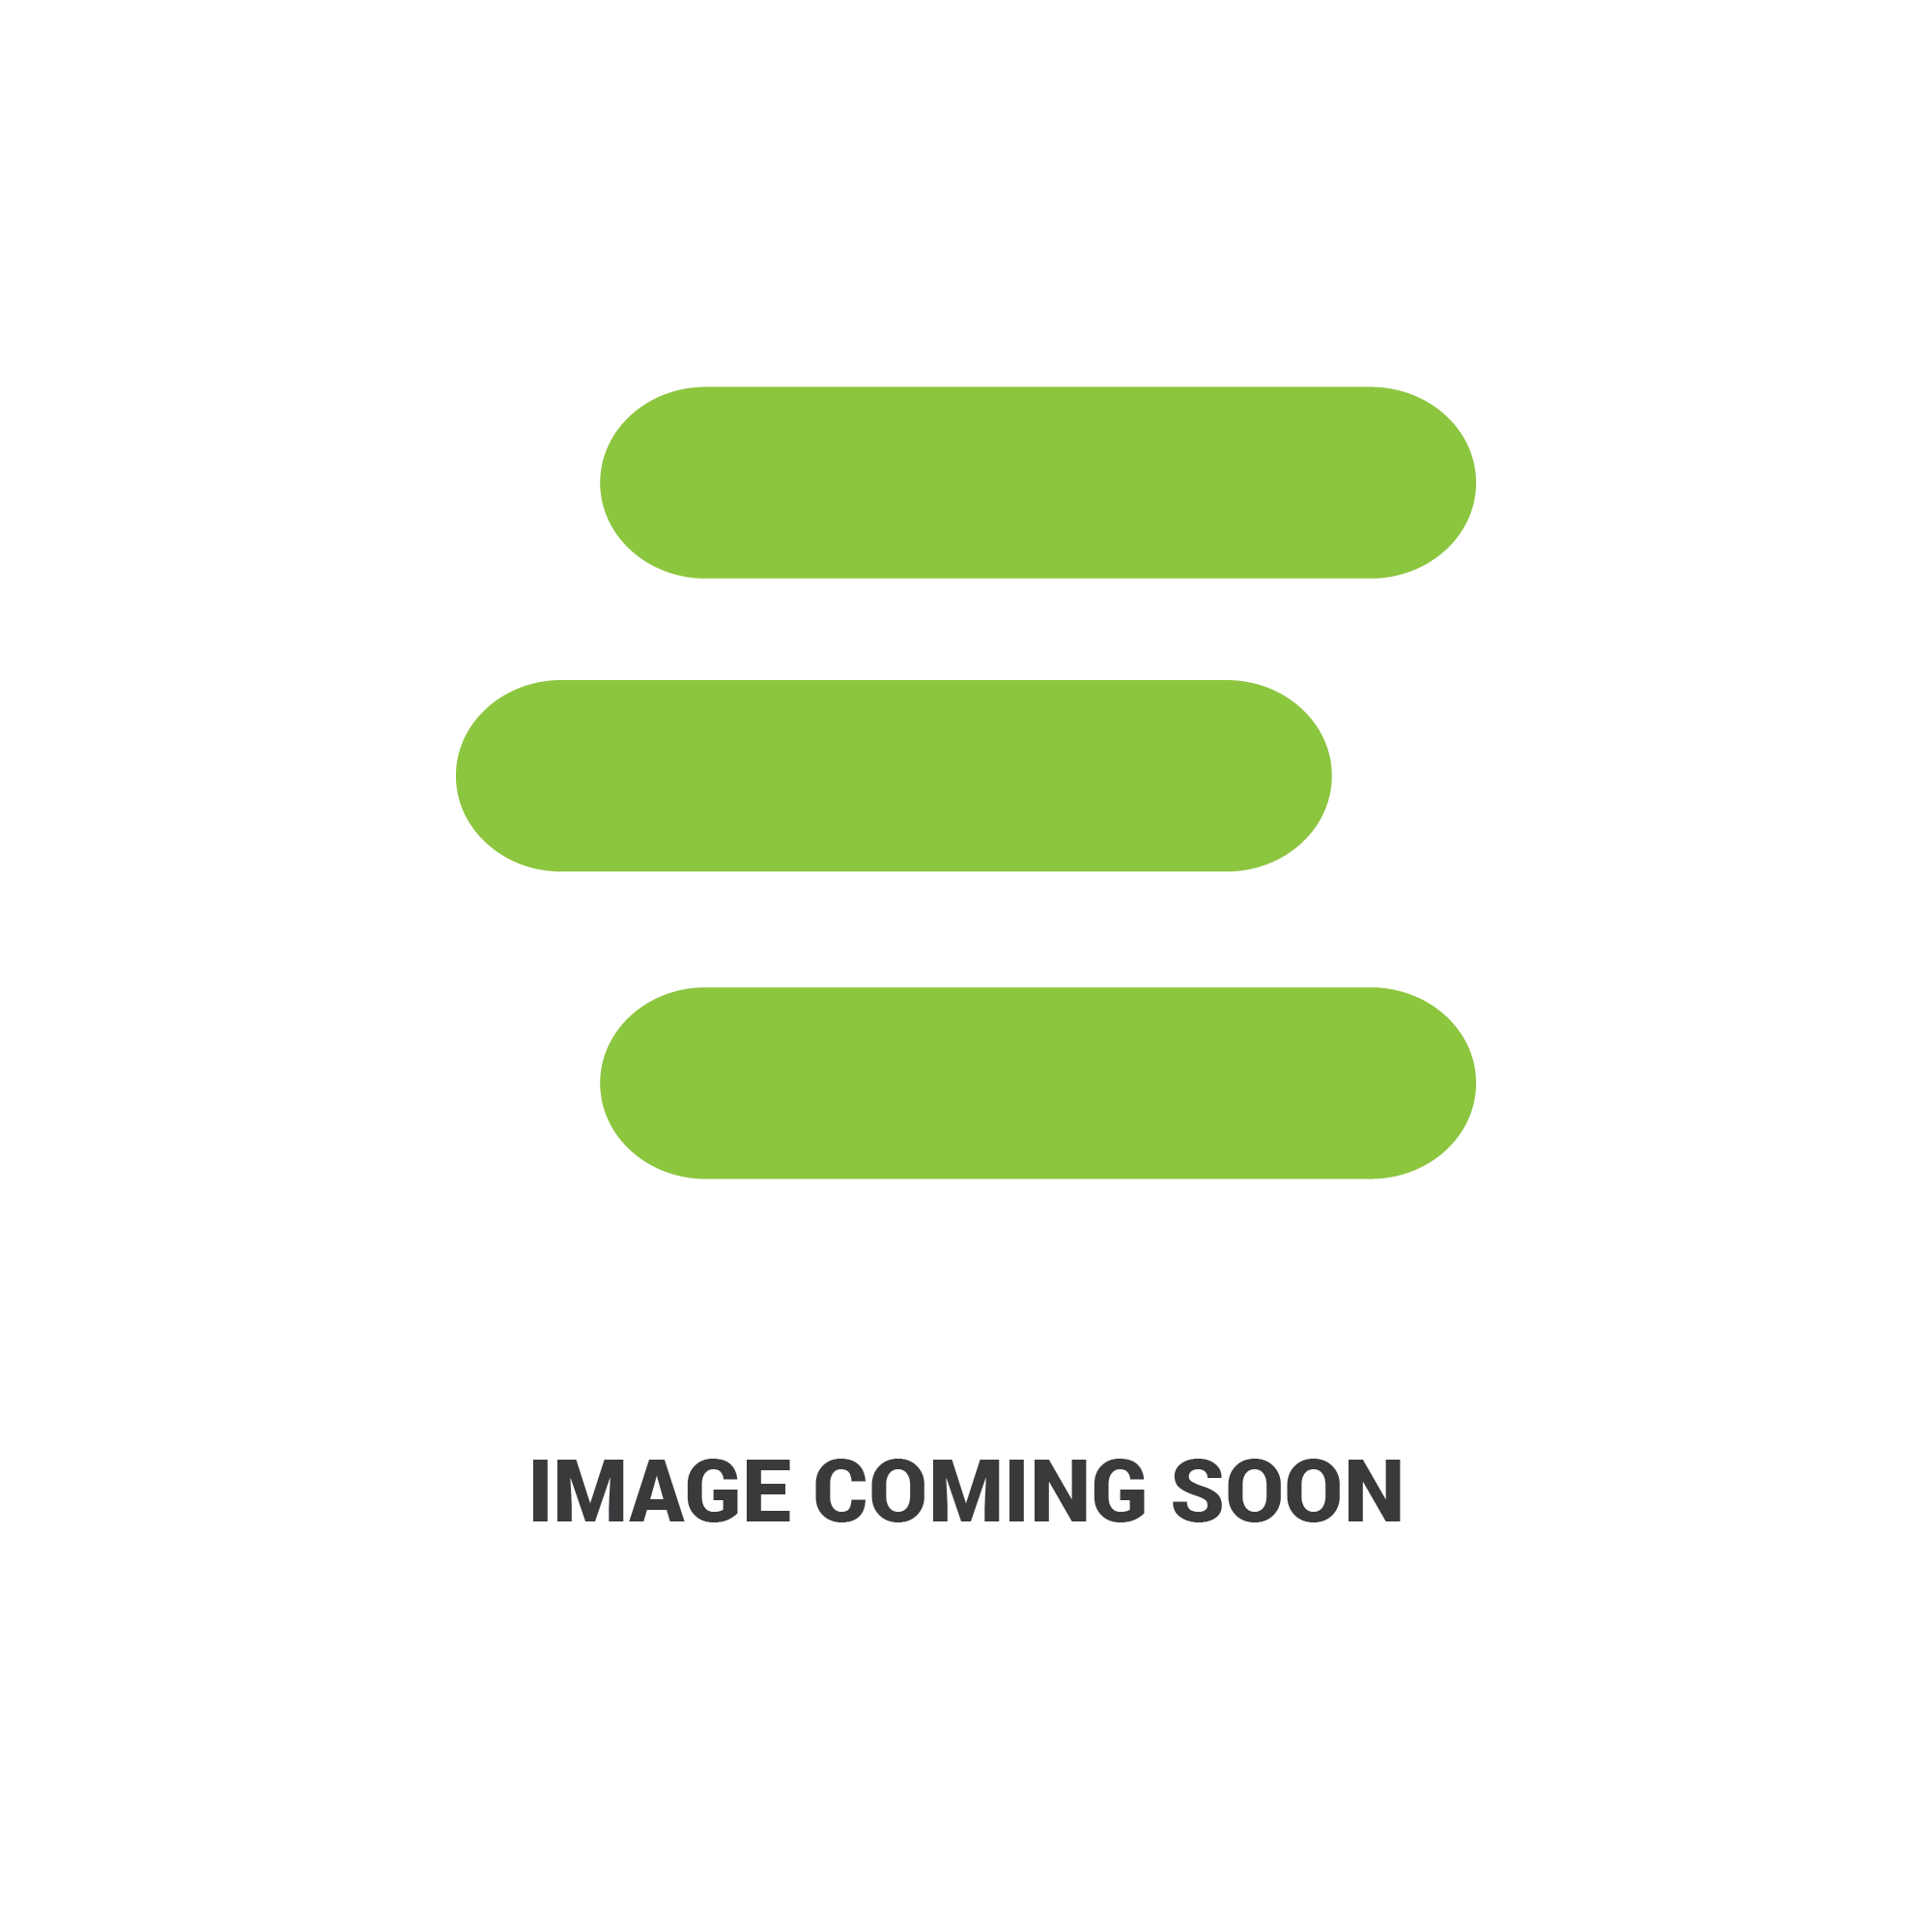 E-6690692edit 1.jpg